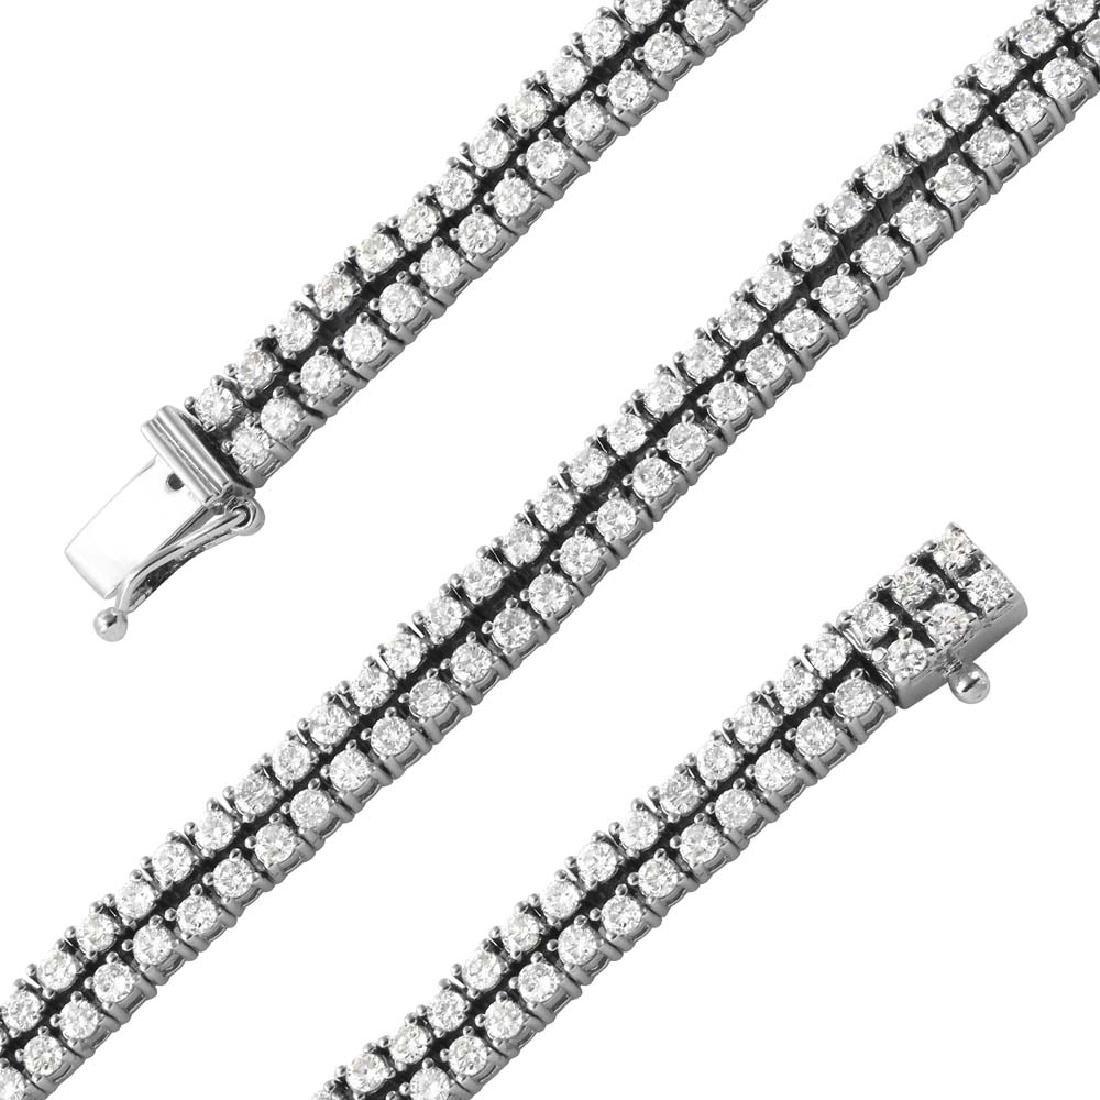 Genuine 3.54 TCW 14K White Gold Ladies Bracelet